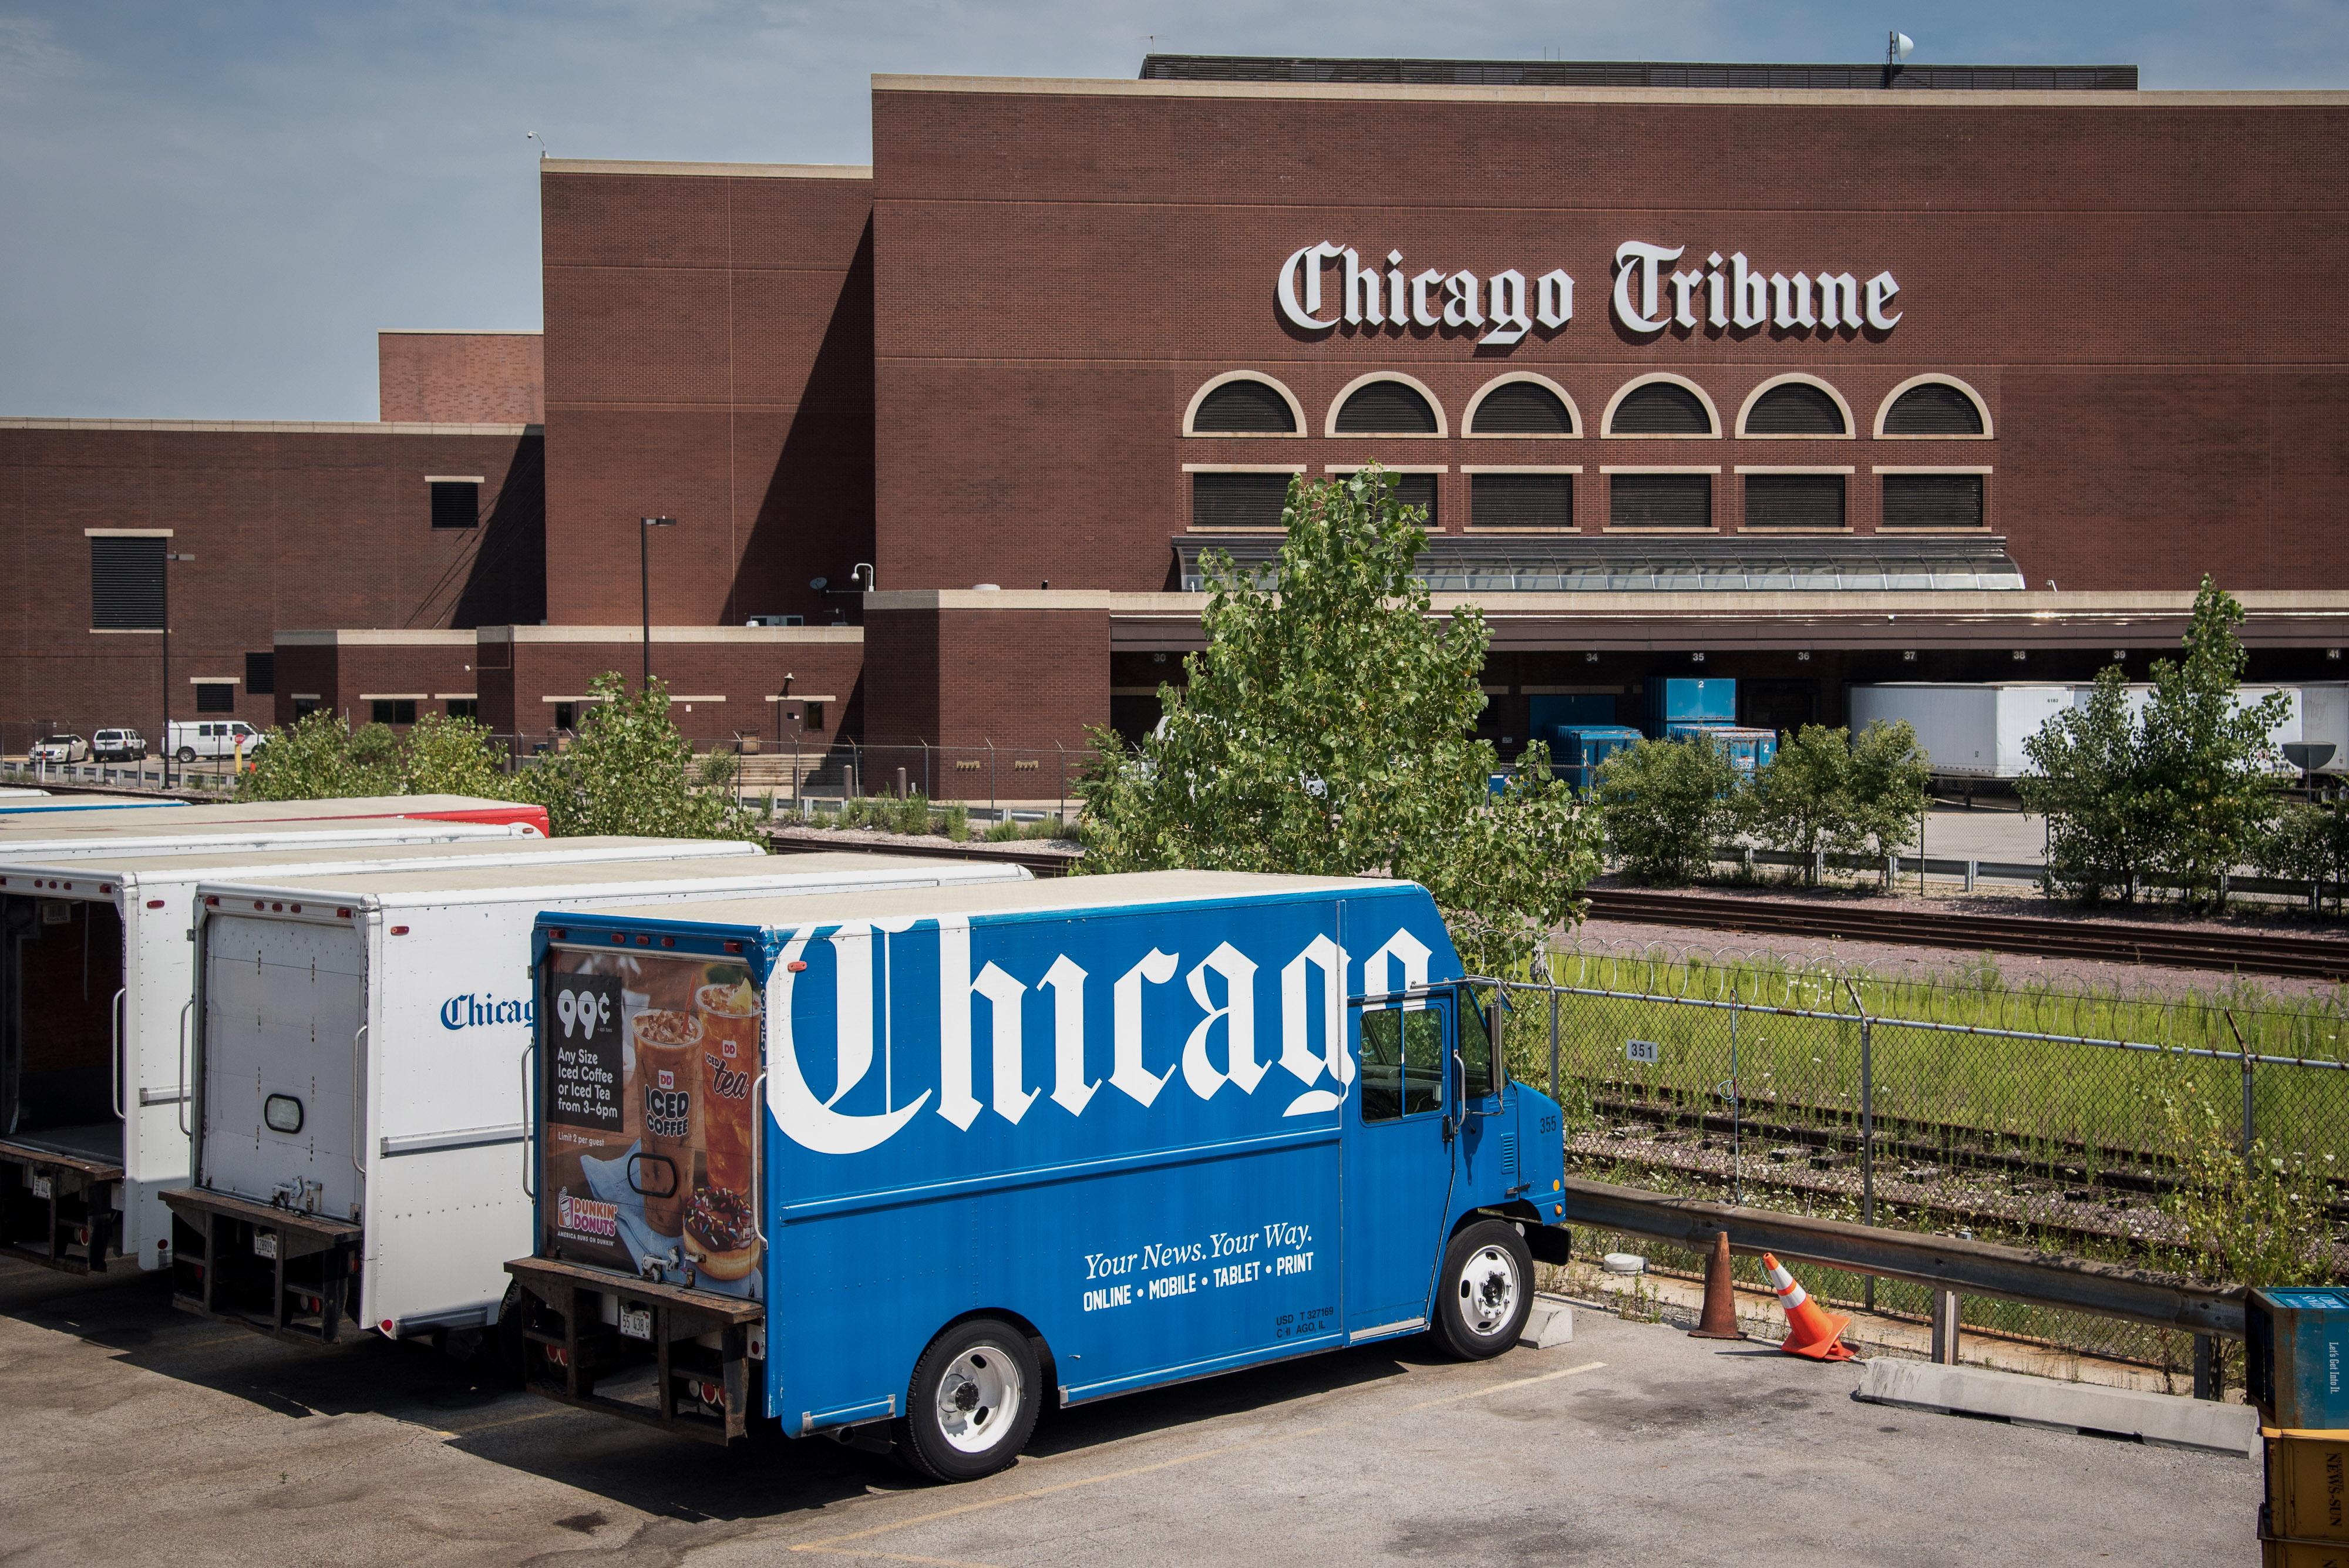 The Chicago Tribune Building Ahead Of Tribune Media Co. Earnings Figures